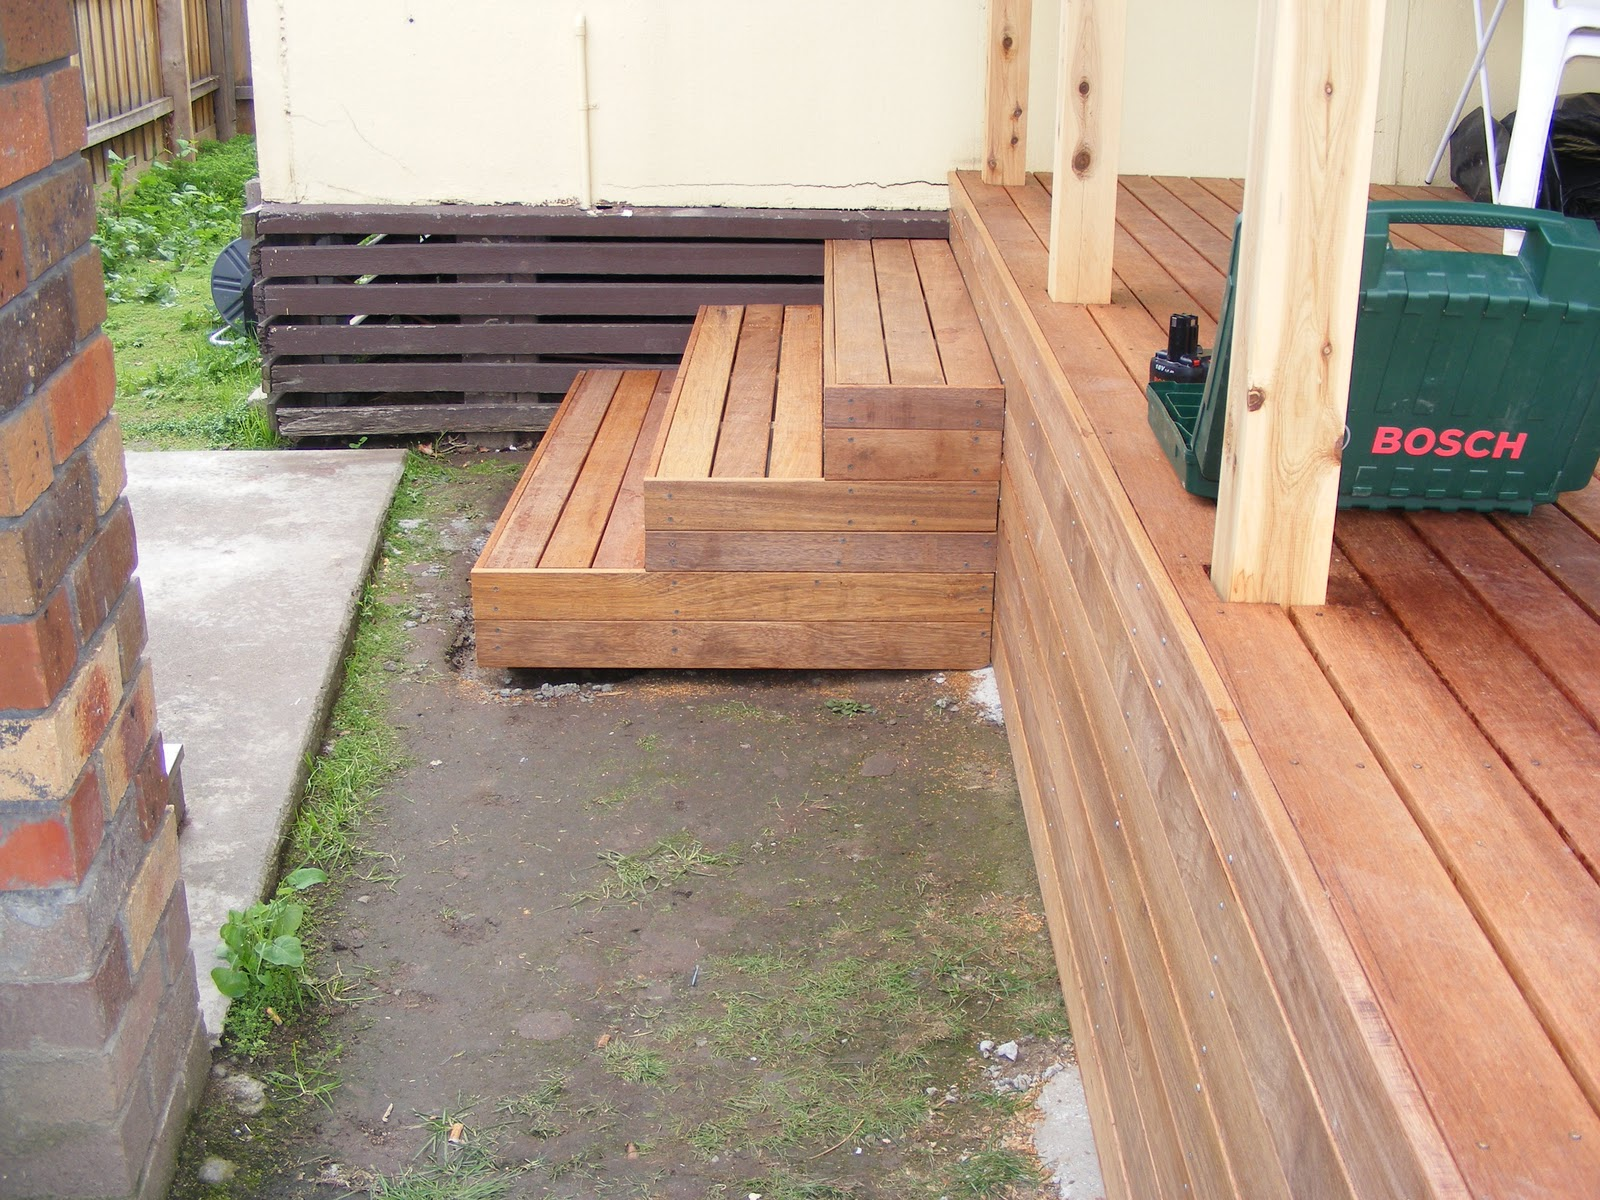 Waynes Home Renos Diy Building Deck Part 3 Stairs | Making Steps For Decking